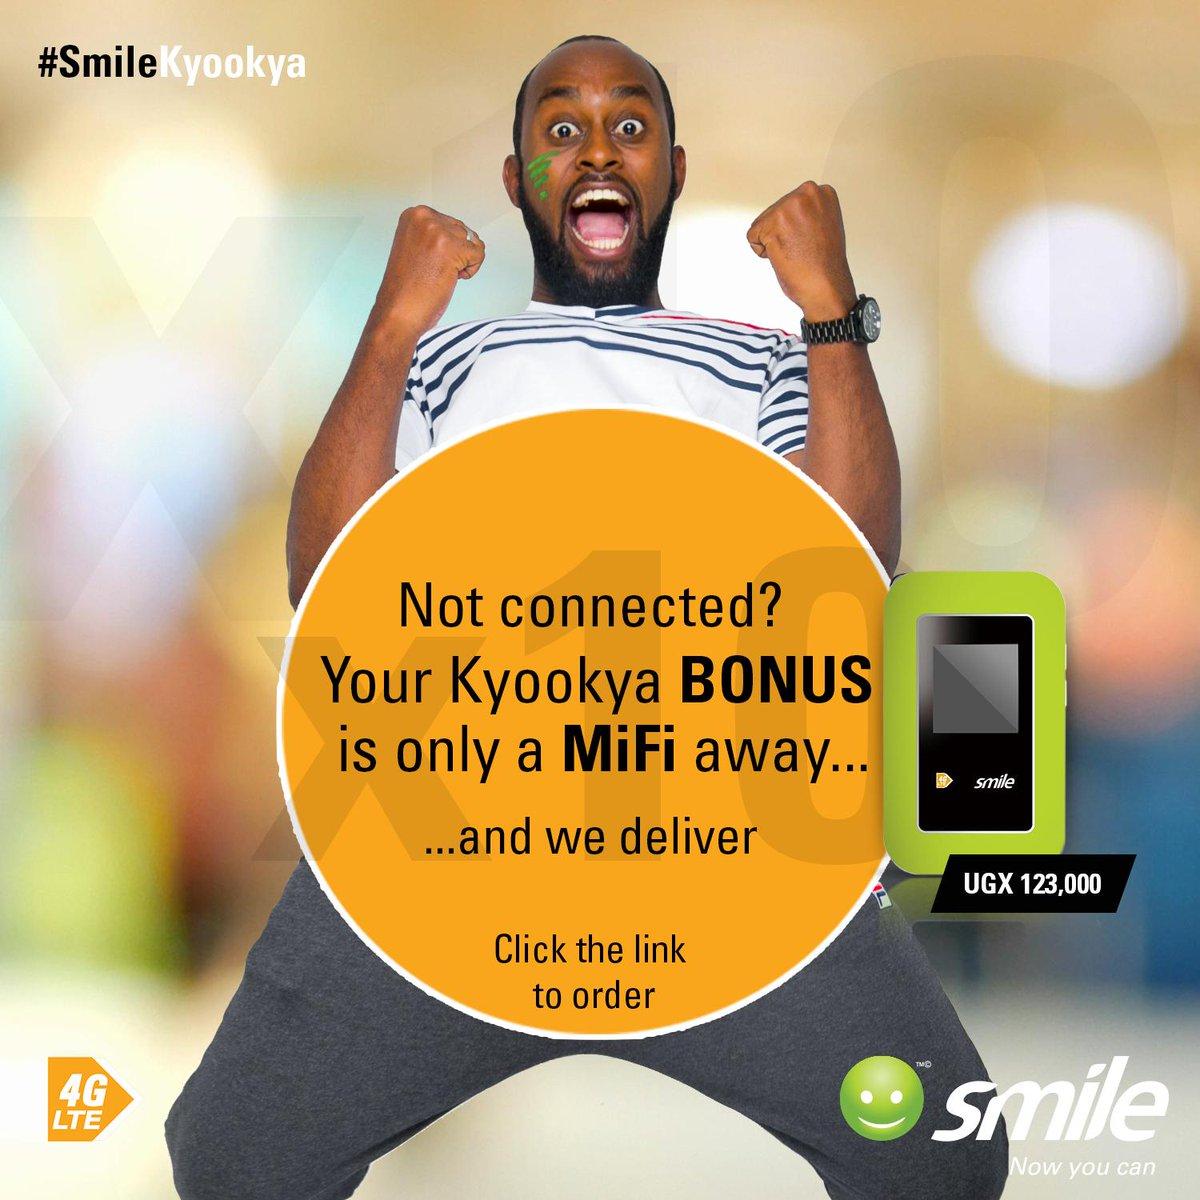 Smile Uganda (@SmileComsUG) | Twitter